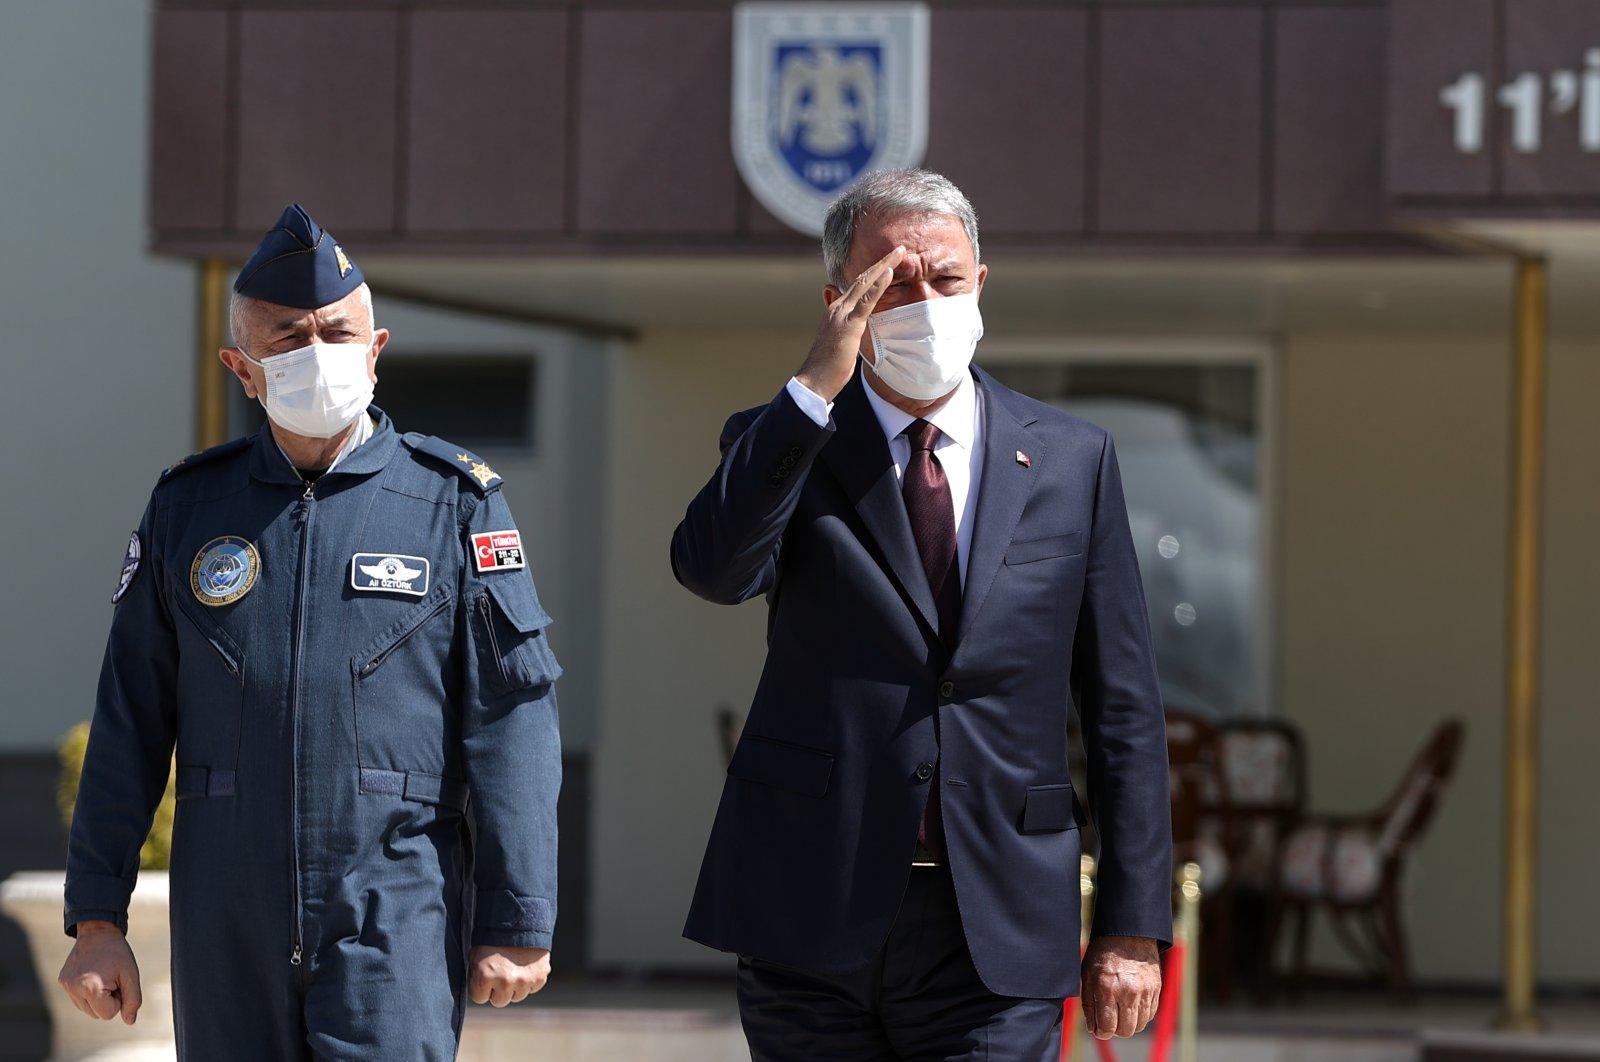 Defense Minister Hulusi Akar departs for Pakistan, in the capital Ankara, Turkey, Aug. 10, 2021.